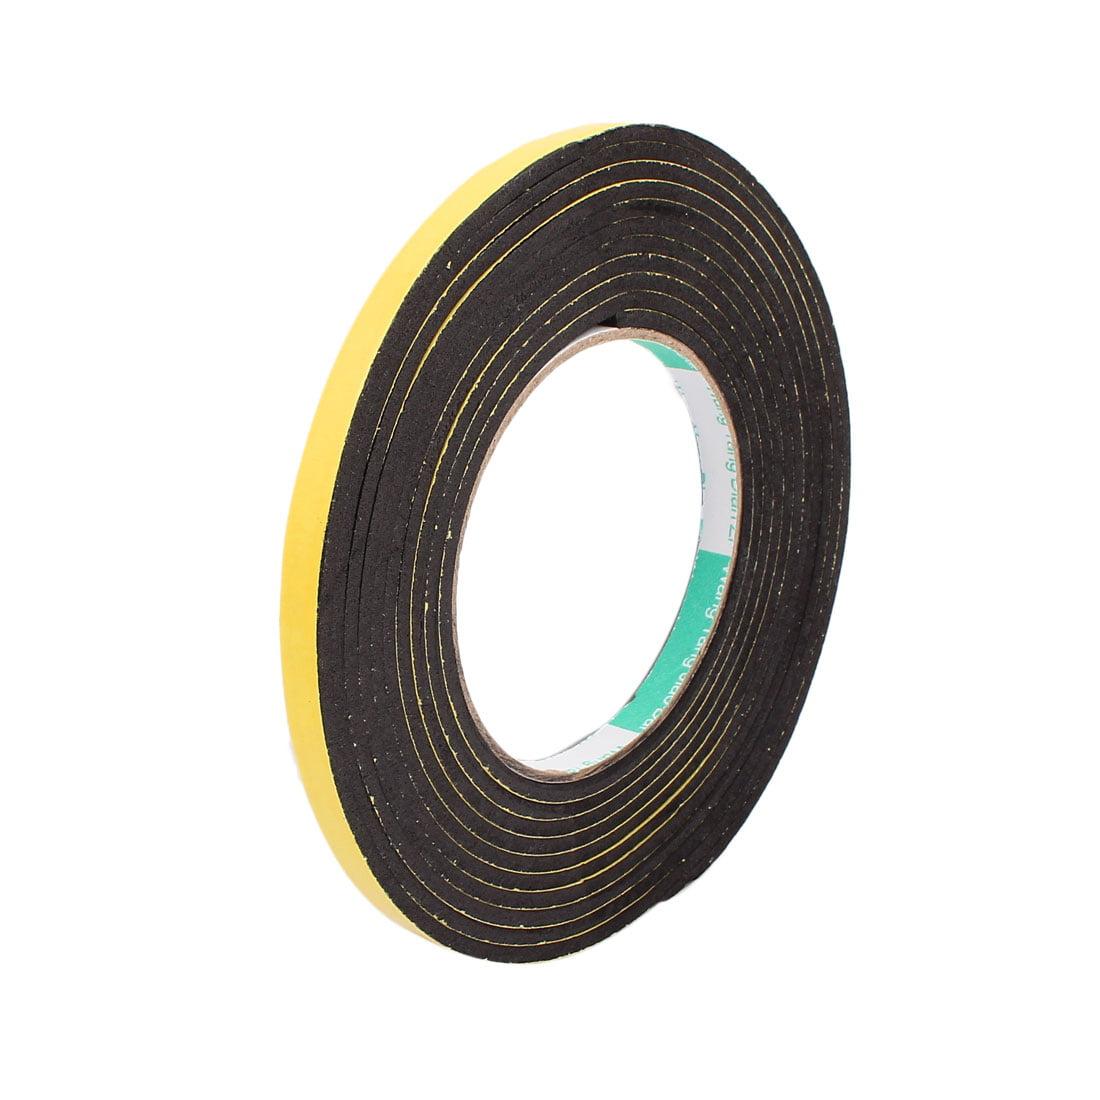 Single Side Shockproof Foam Tape Adhesive Sponge Tape 8mm Wide x 4M Length